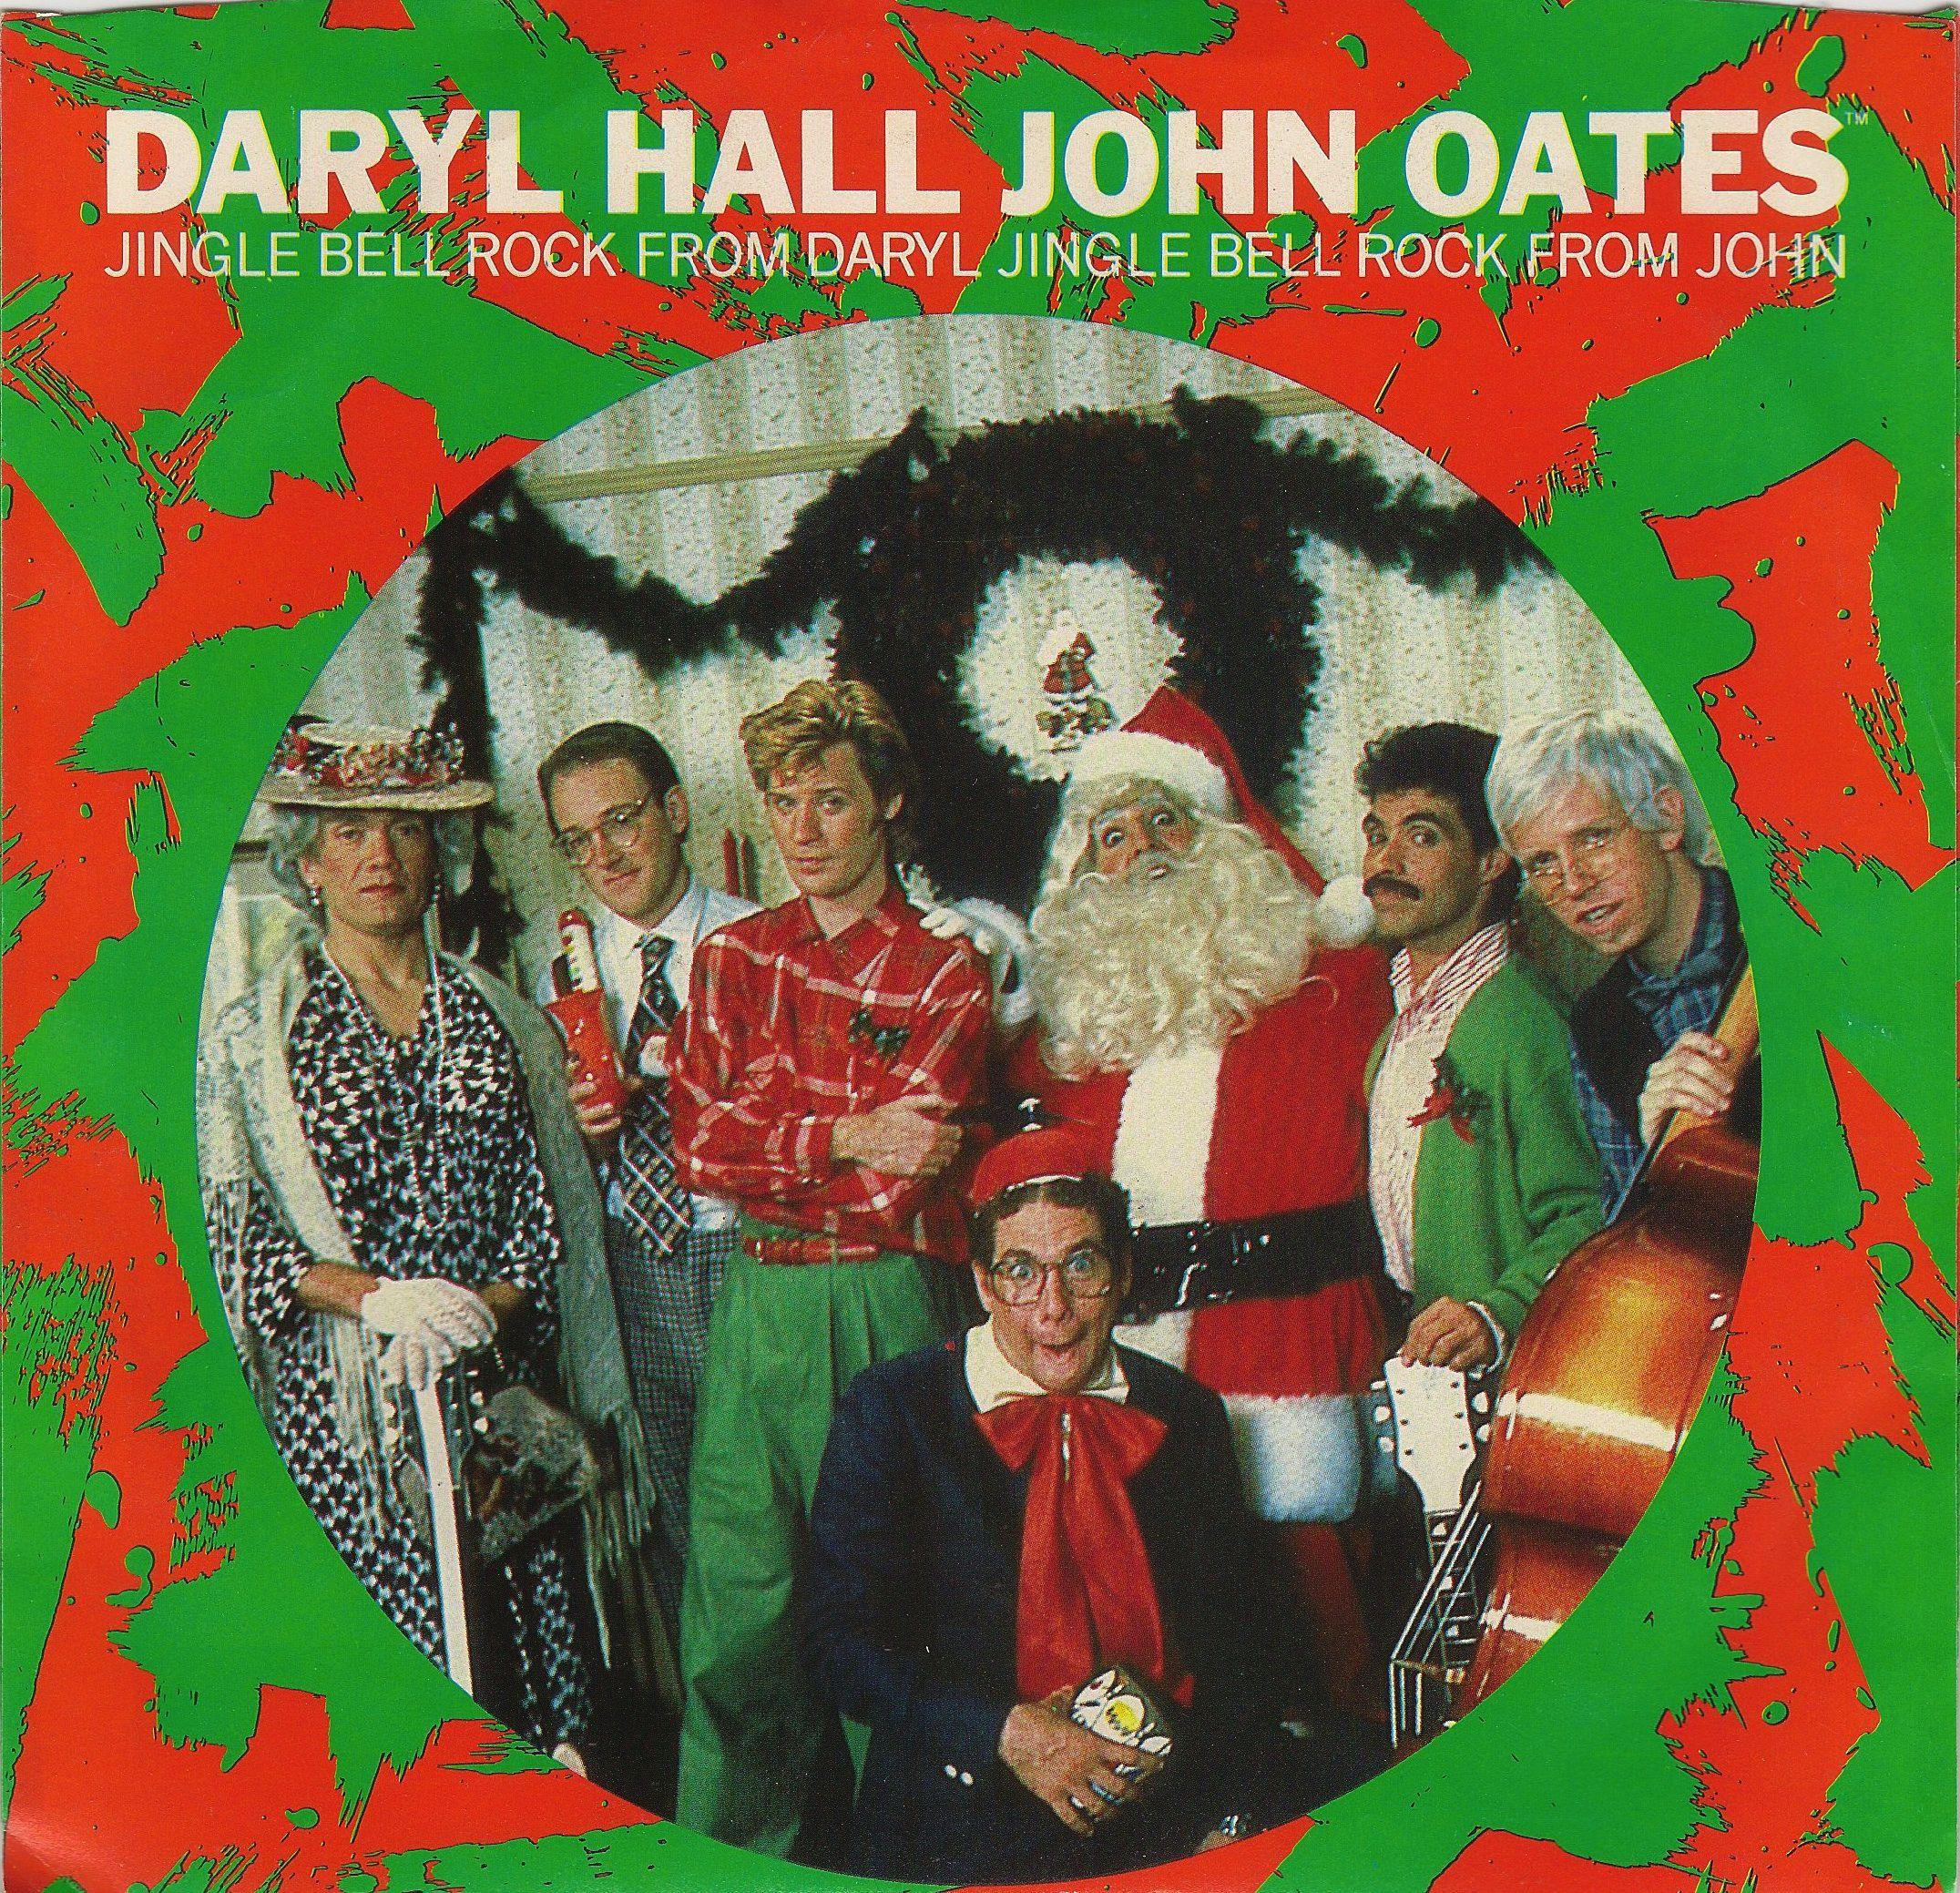 Daryl Hall John Oates Jingle Bell Rock